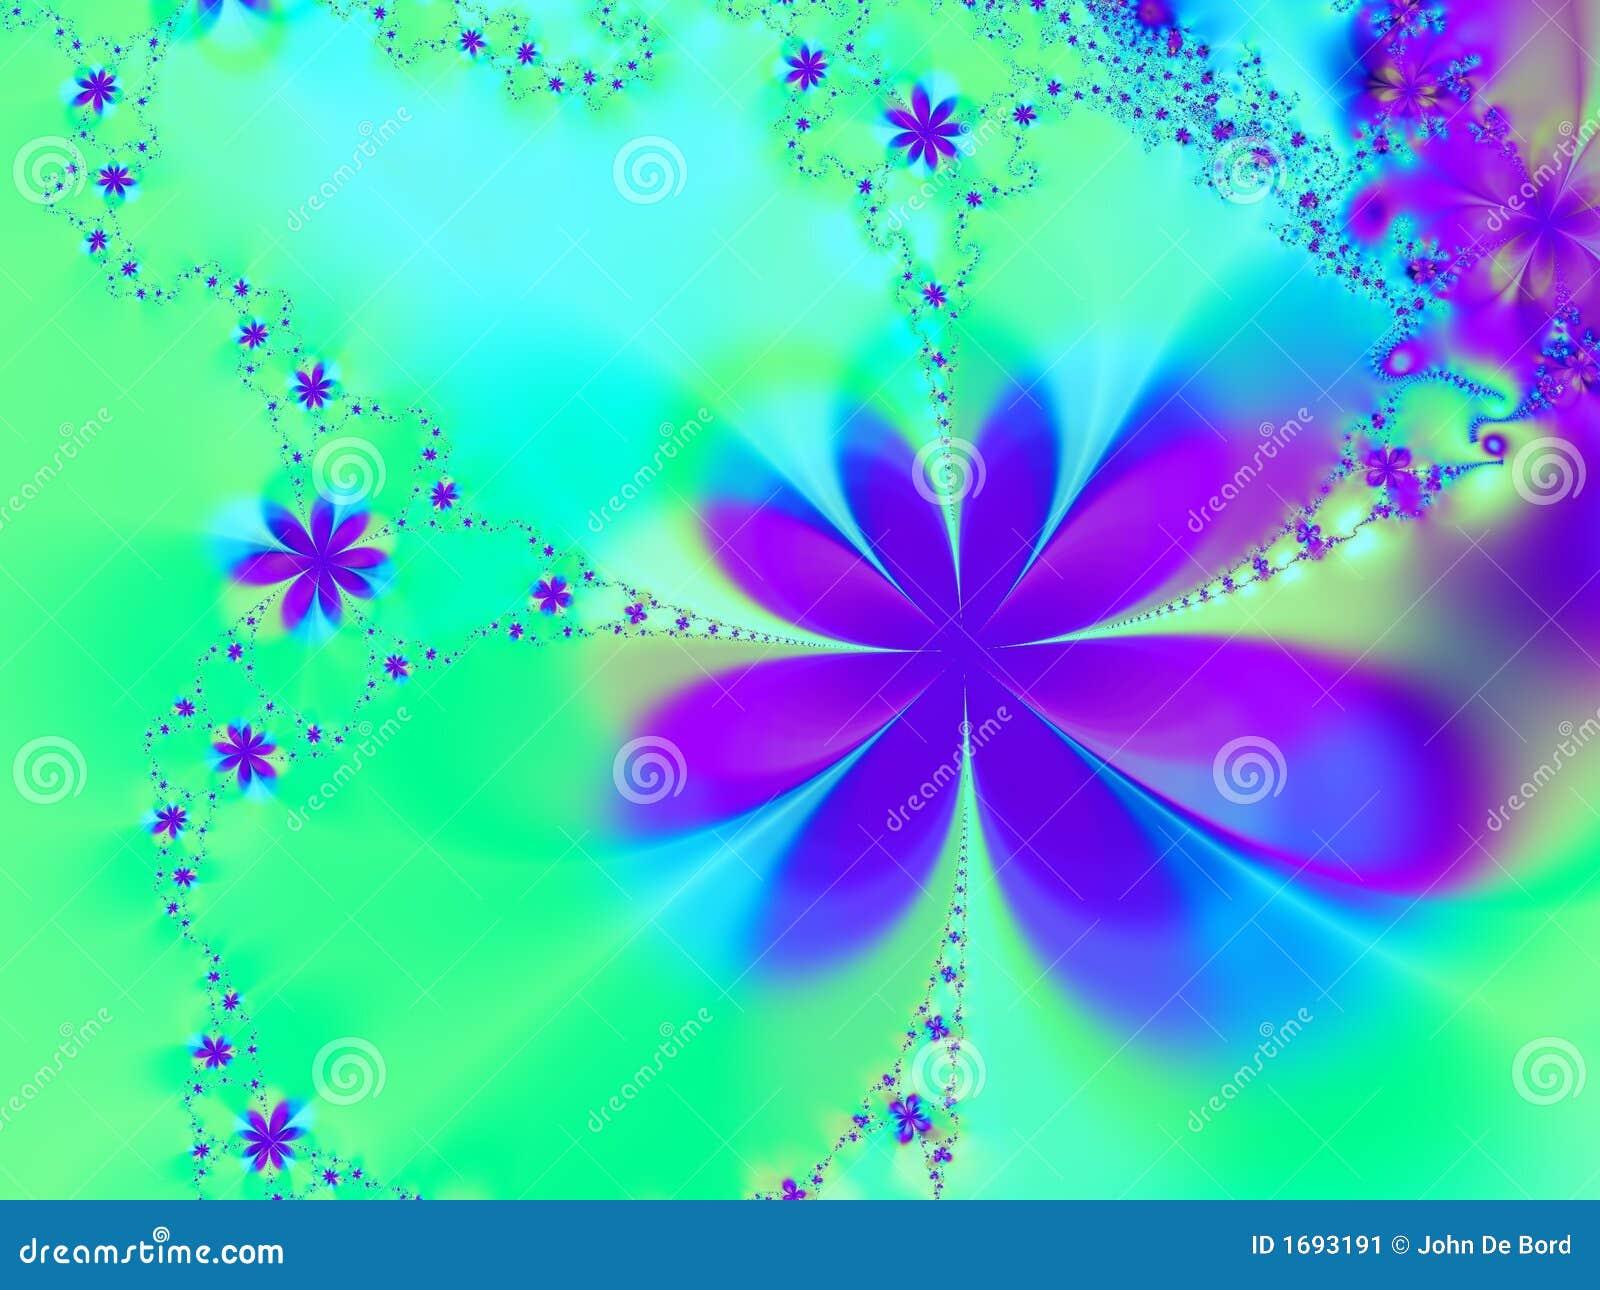 Aqua And Purple Star